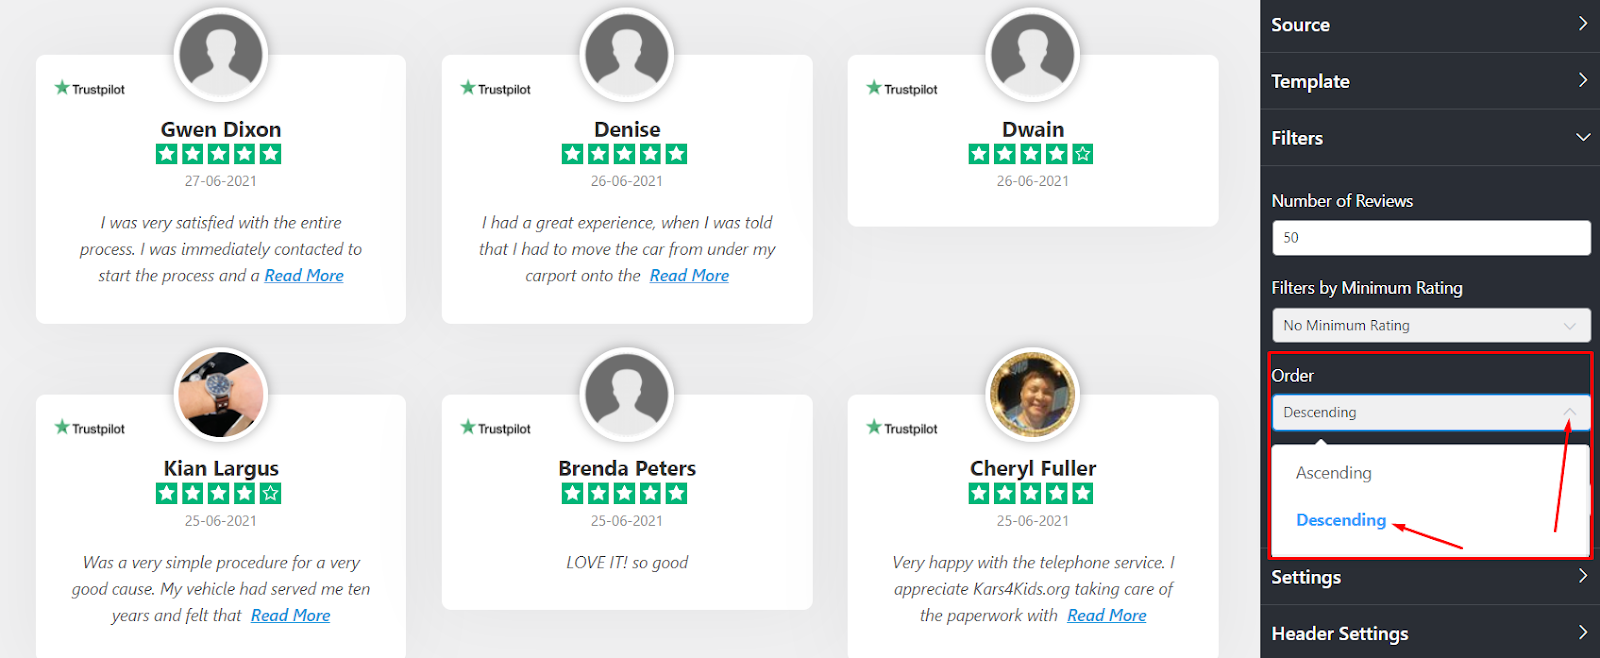 Trustpilot reviews order